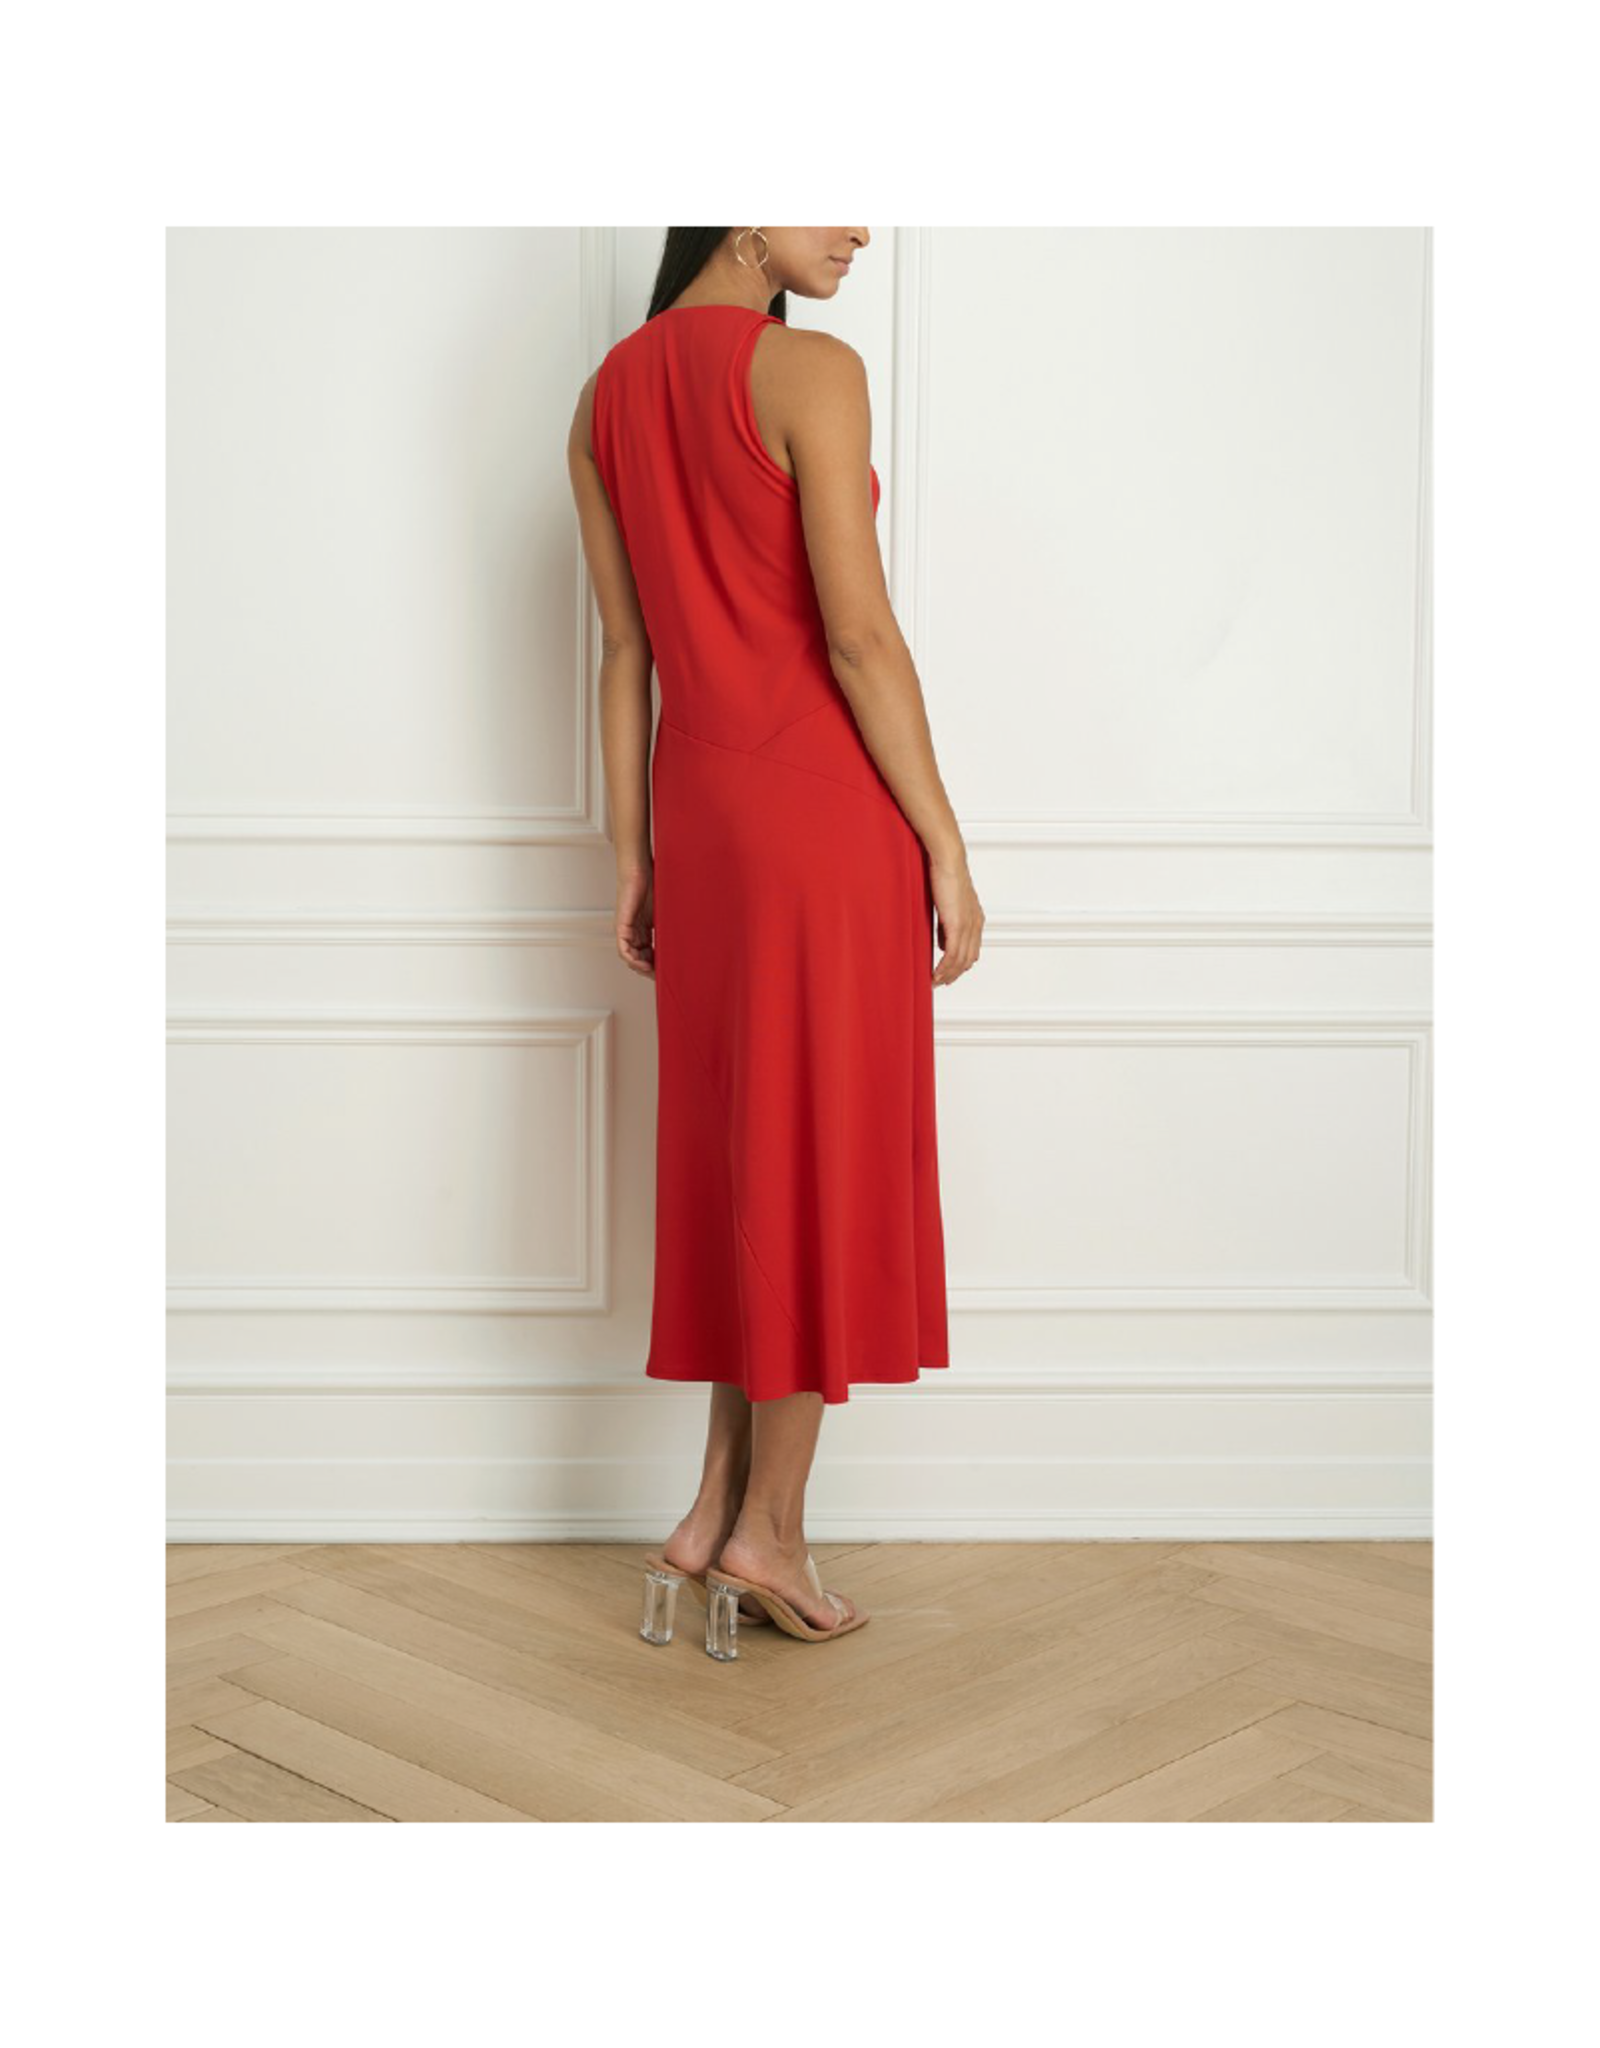 Iris V-Neck Sleeveless Dress